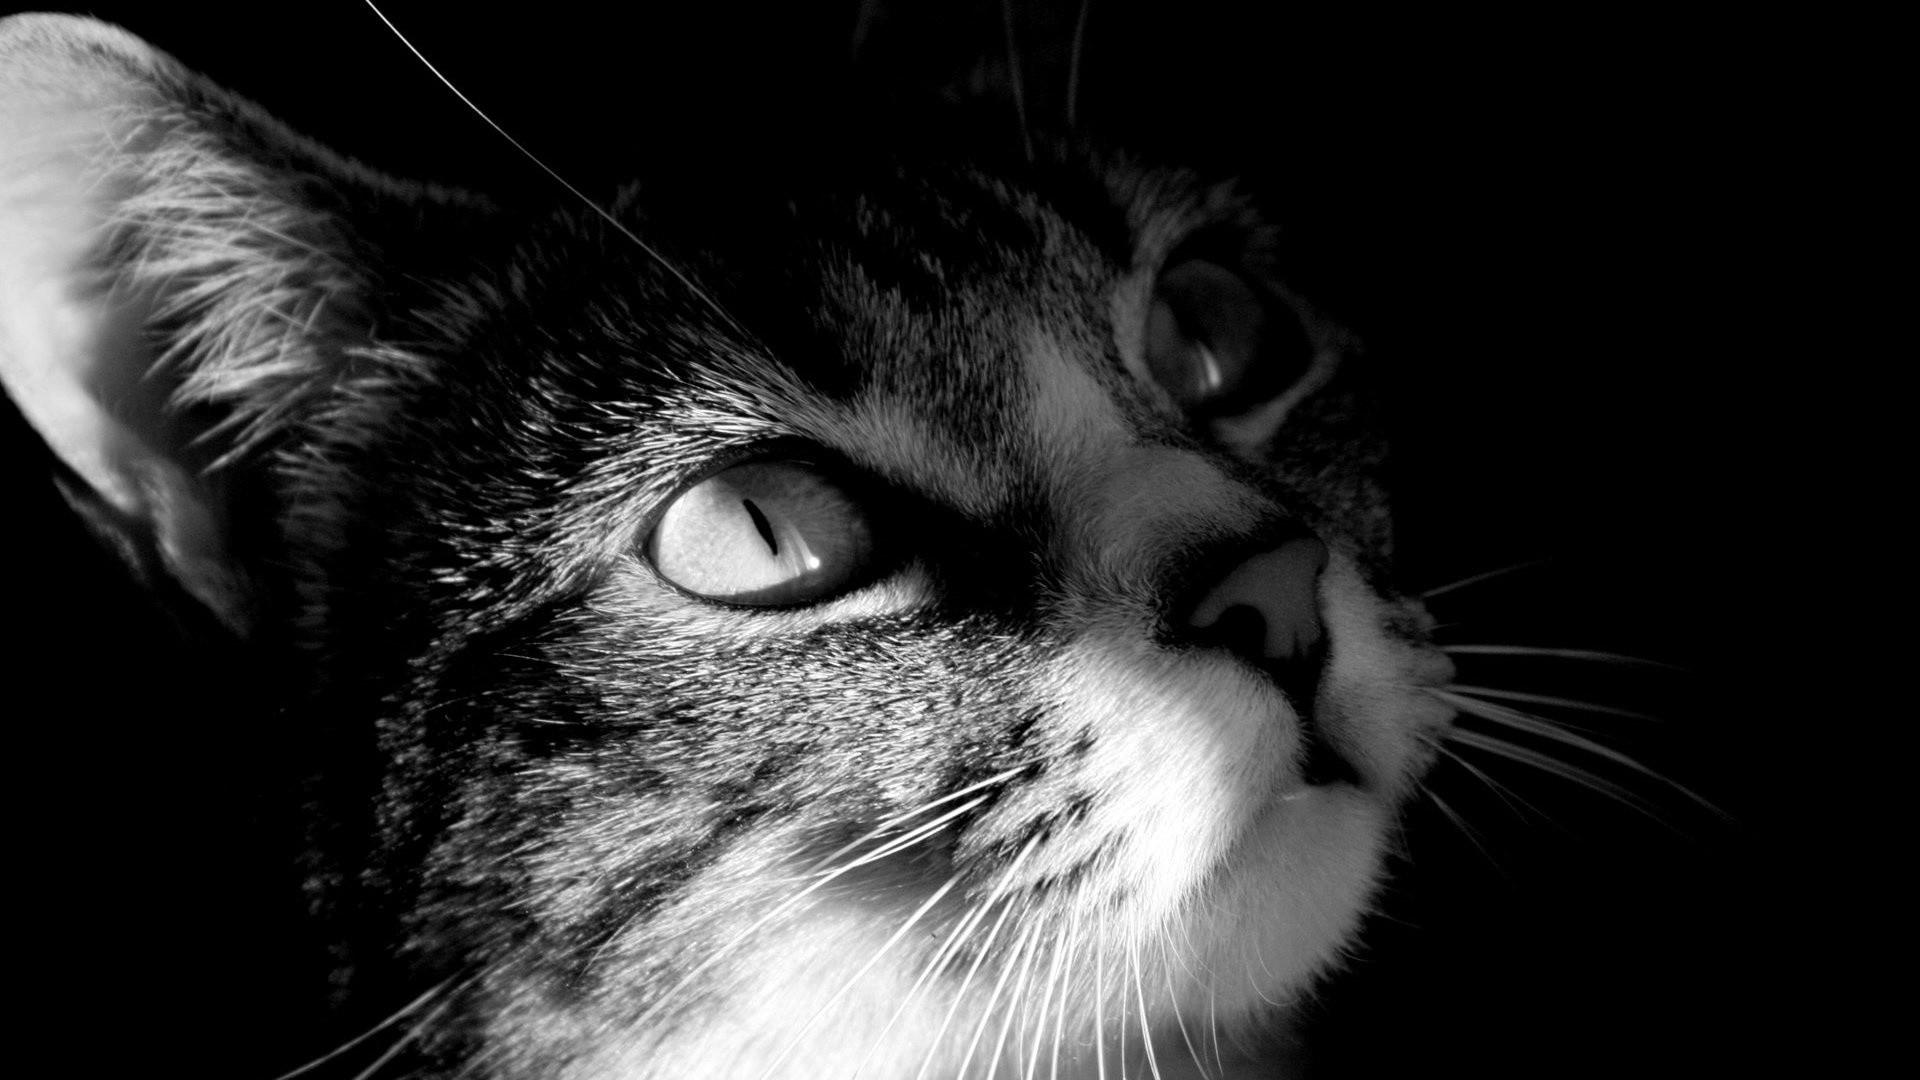 … cat wallpaper 4 i love cats cute cat kitten pictures …